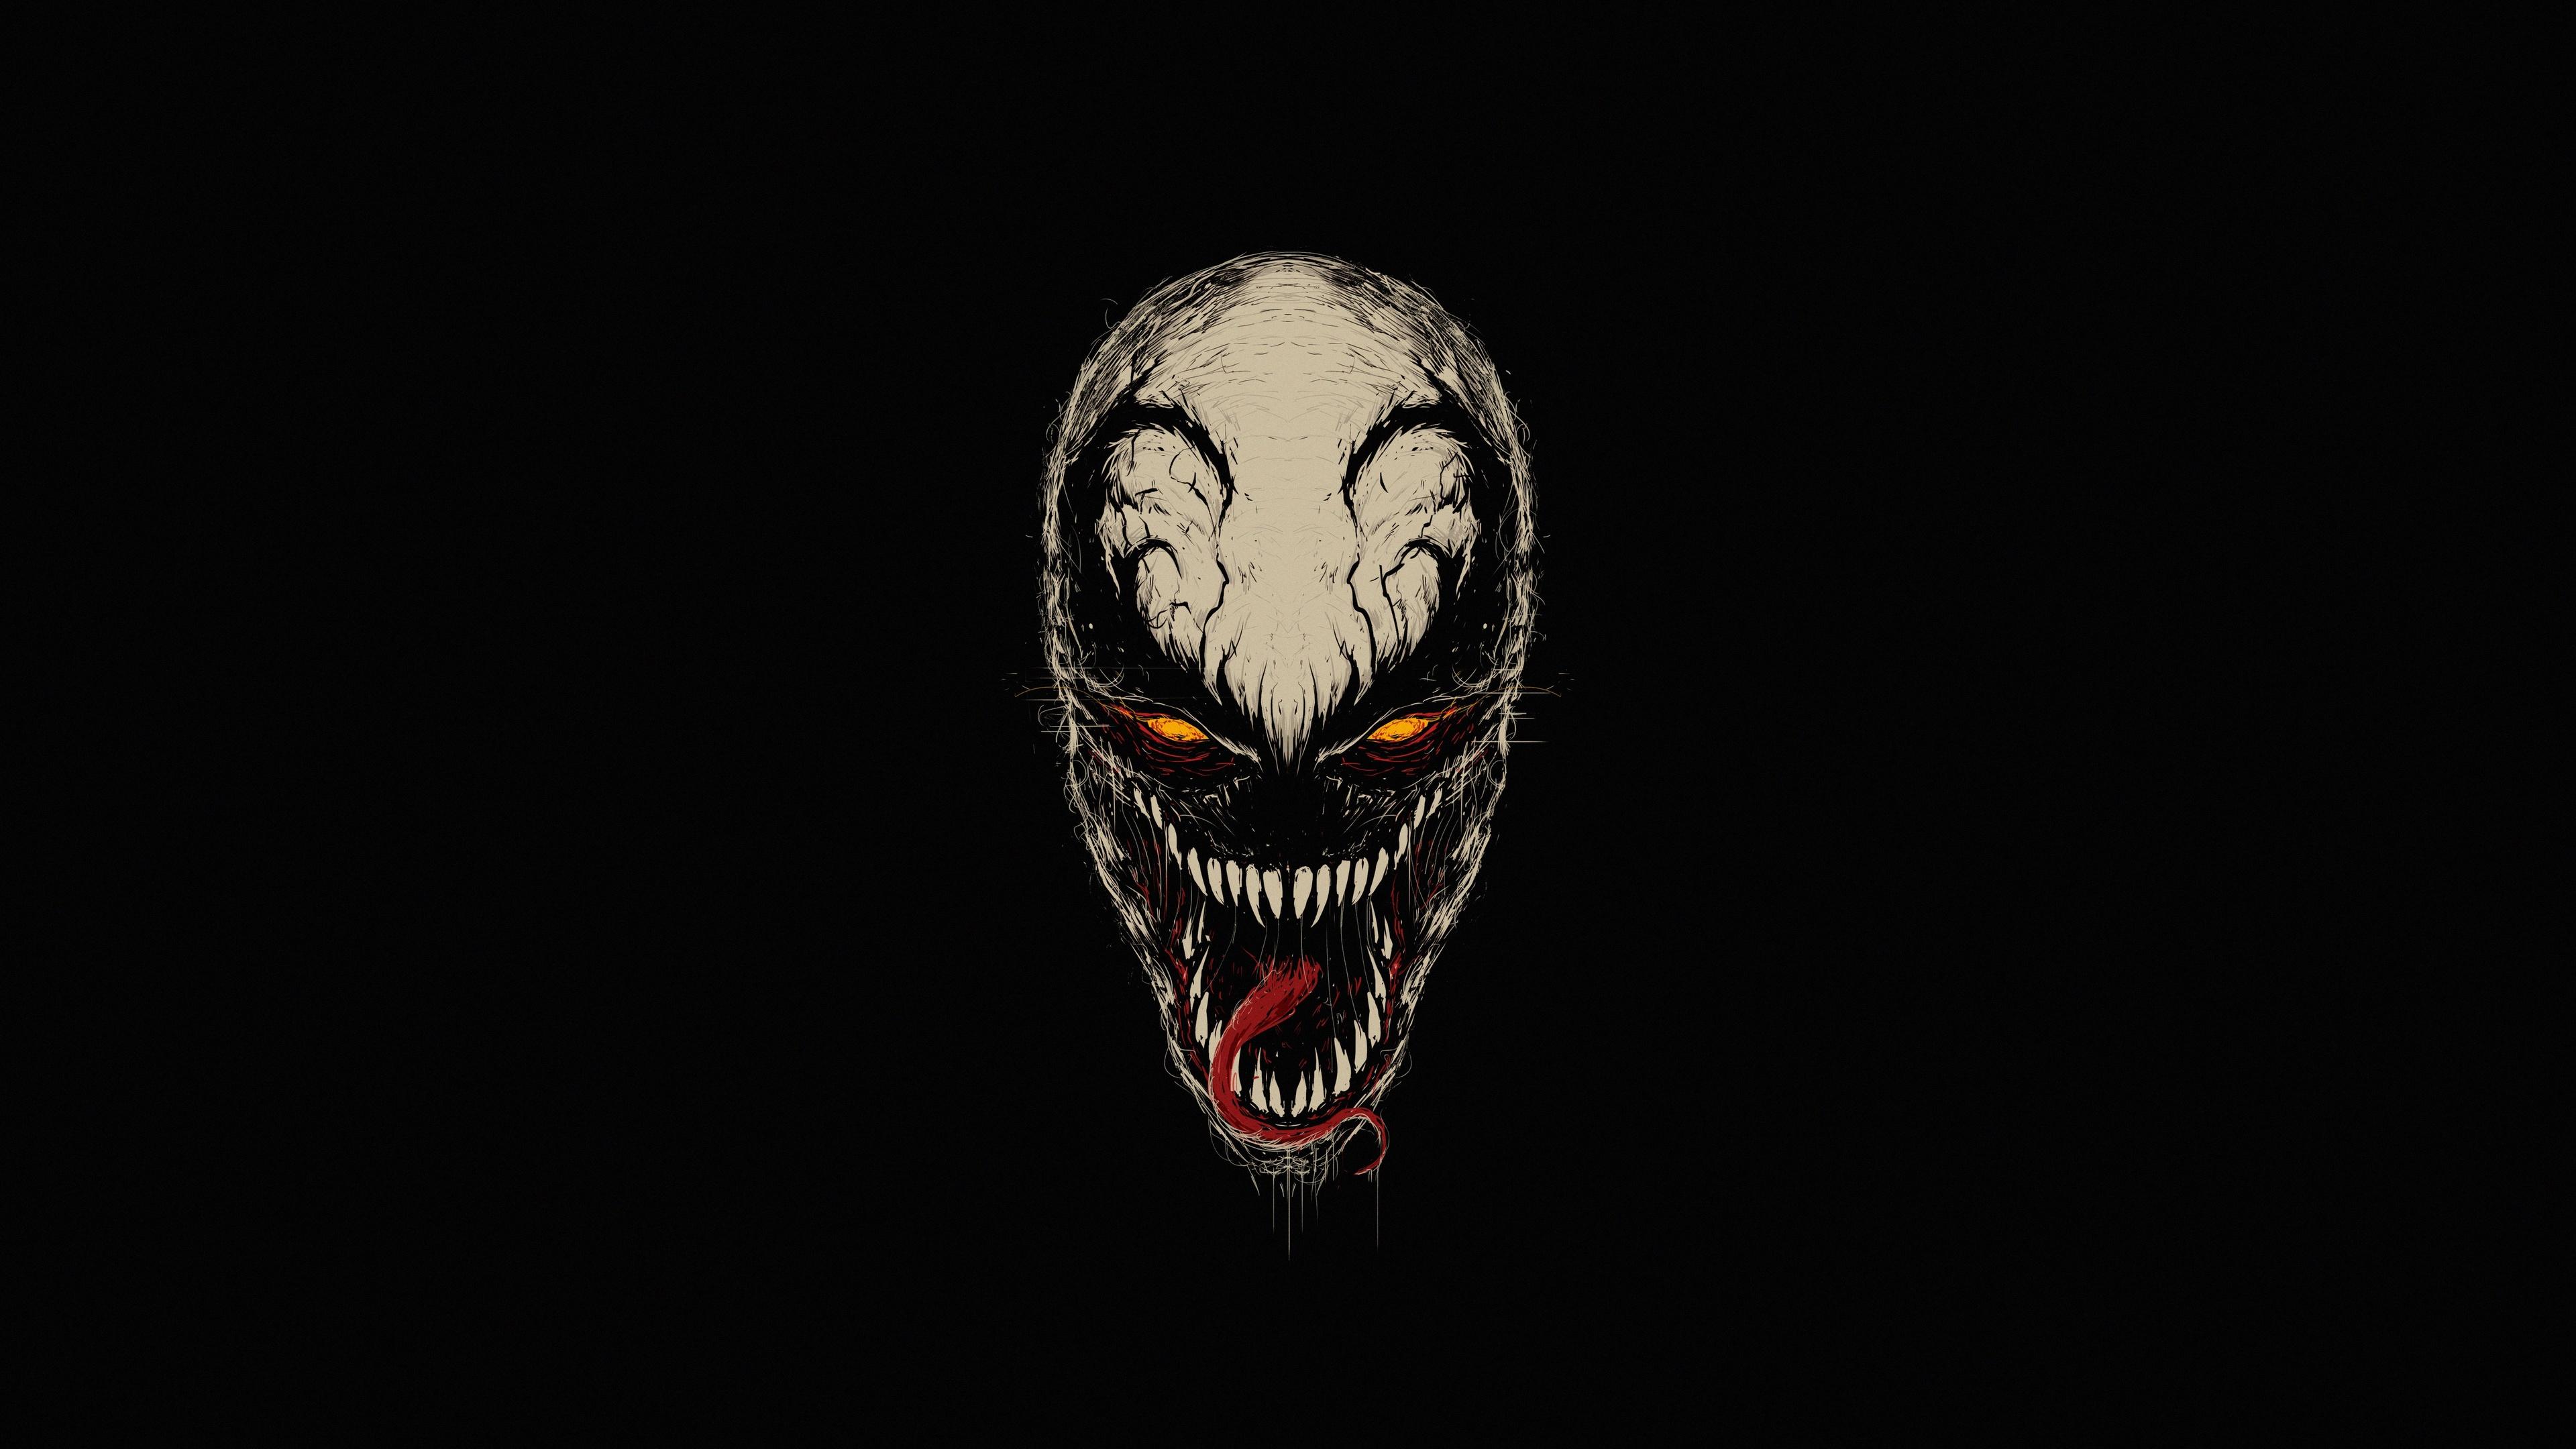 anti venom 1568054823 - Anti Venom - Venom wallpapers, superheroes wallpapers, hd-wallpapers, artstation wallpapers, 4k-wallpapers